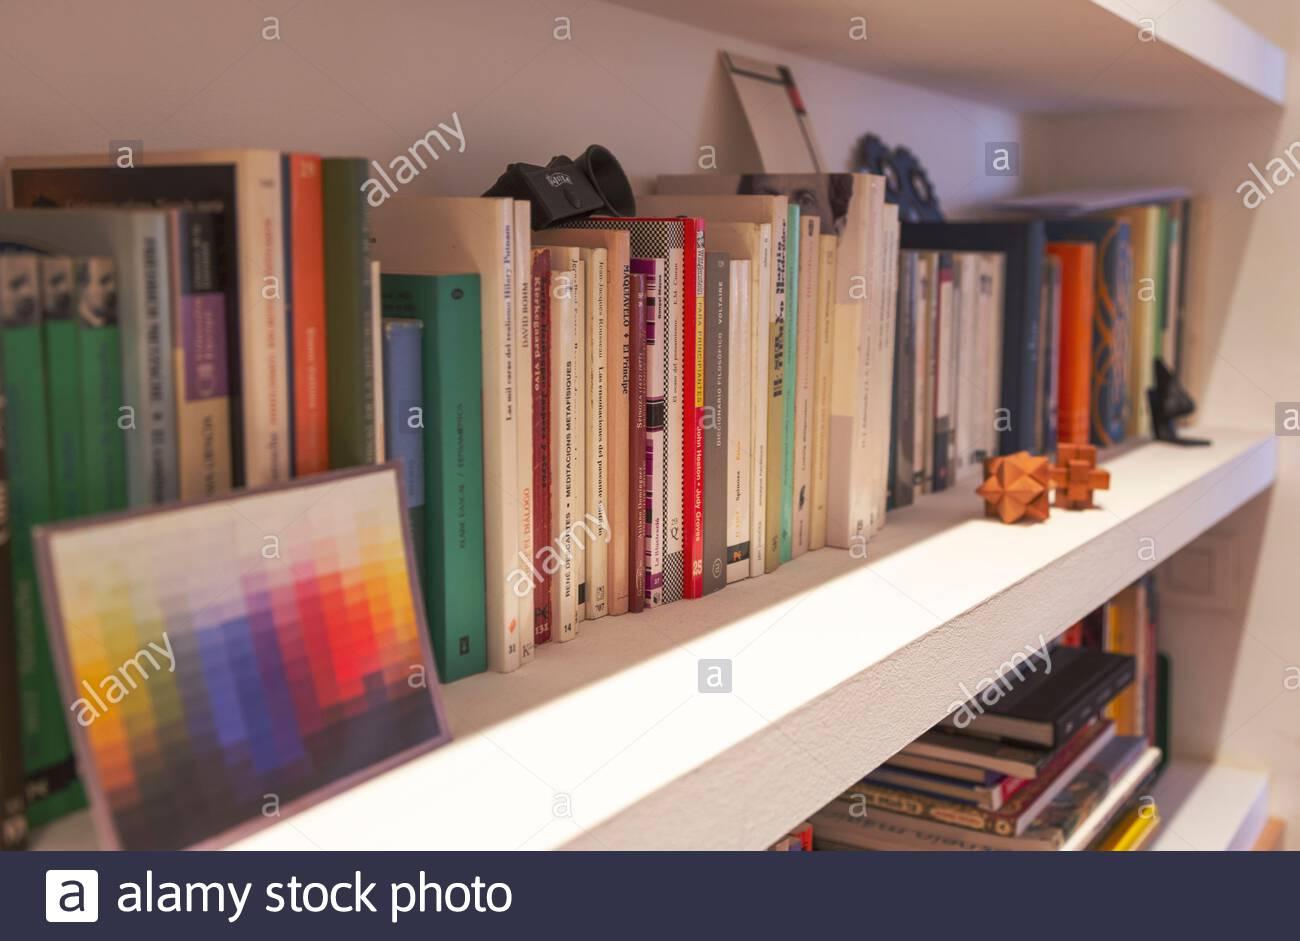 Libreria Per Libri Pesanti libri pesanti immagini & libri pesanti fotos stock - alamy